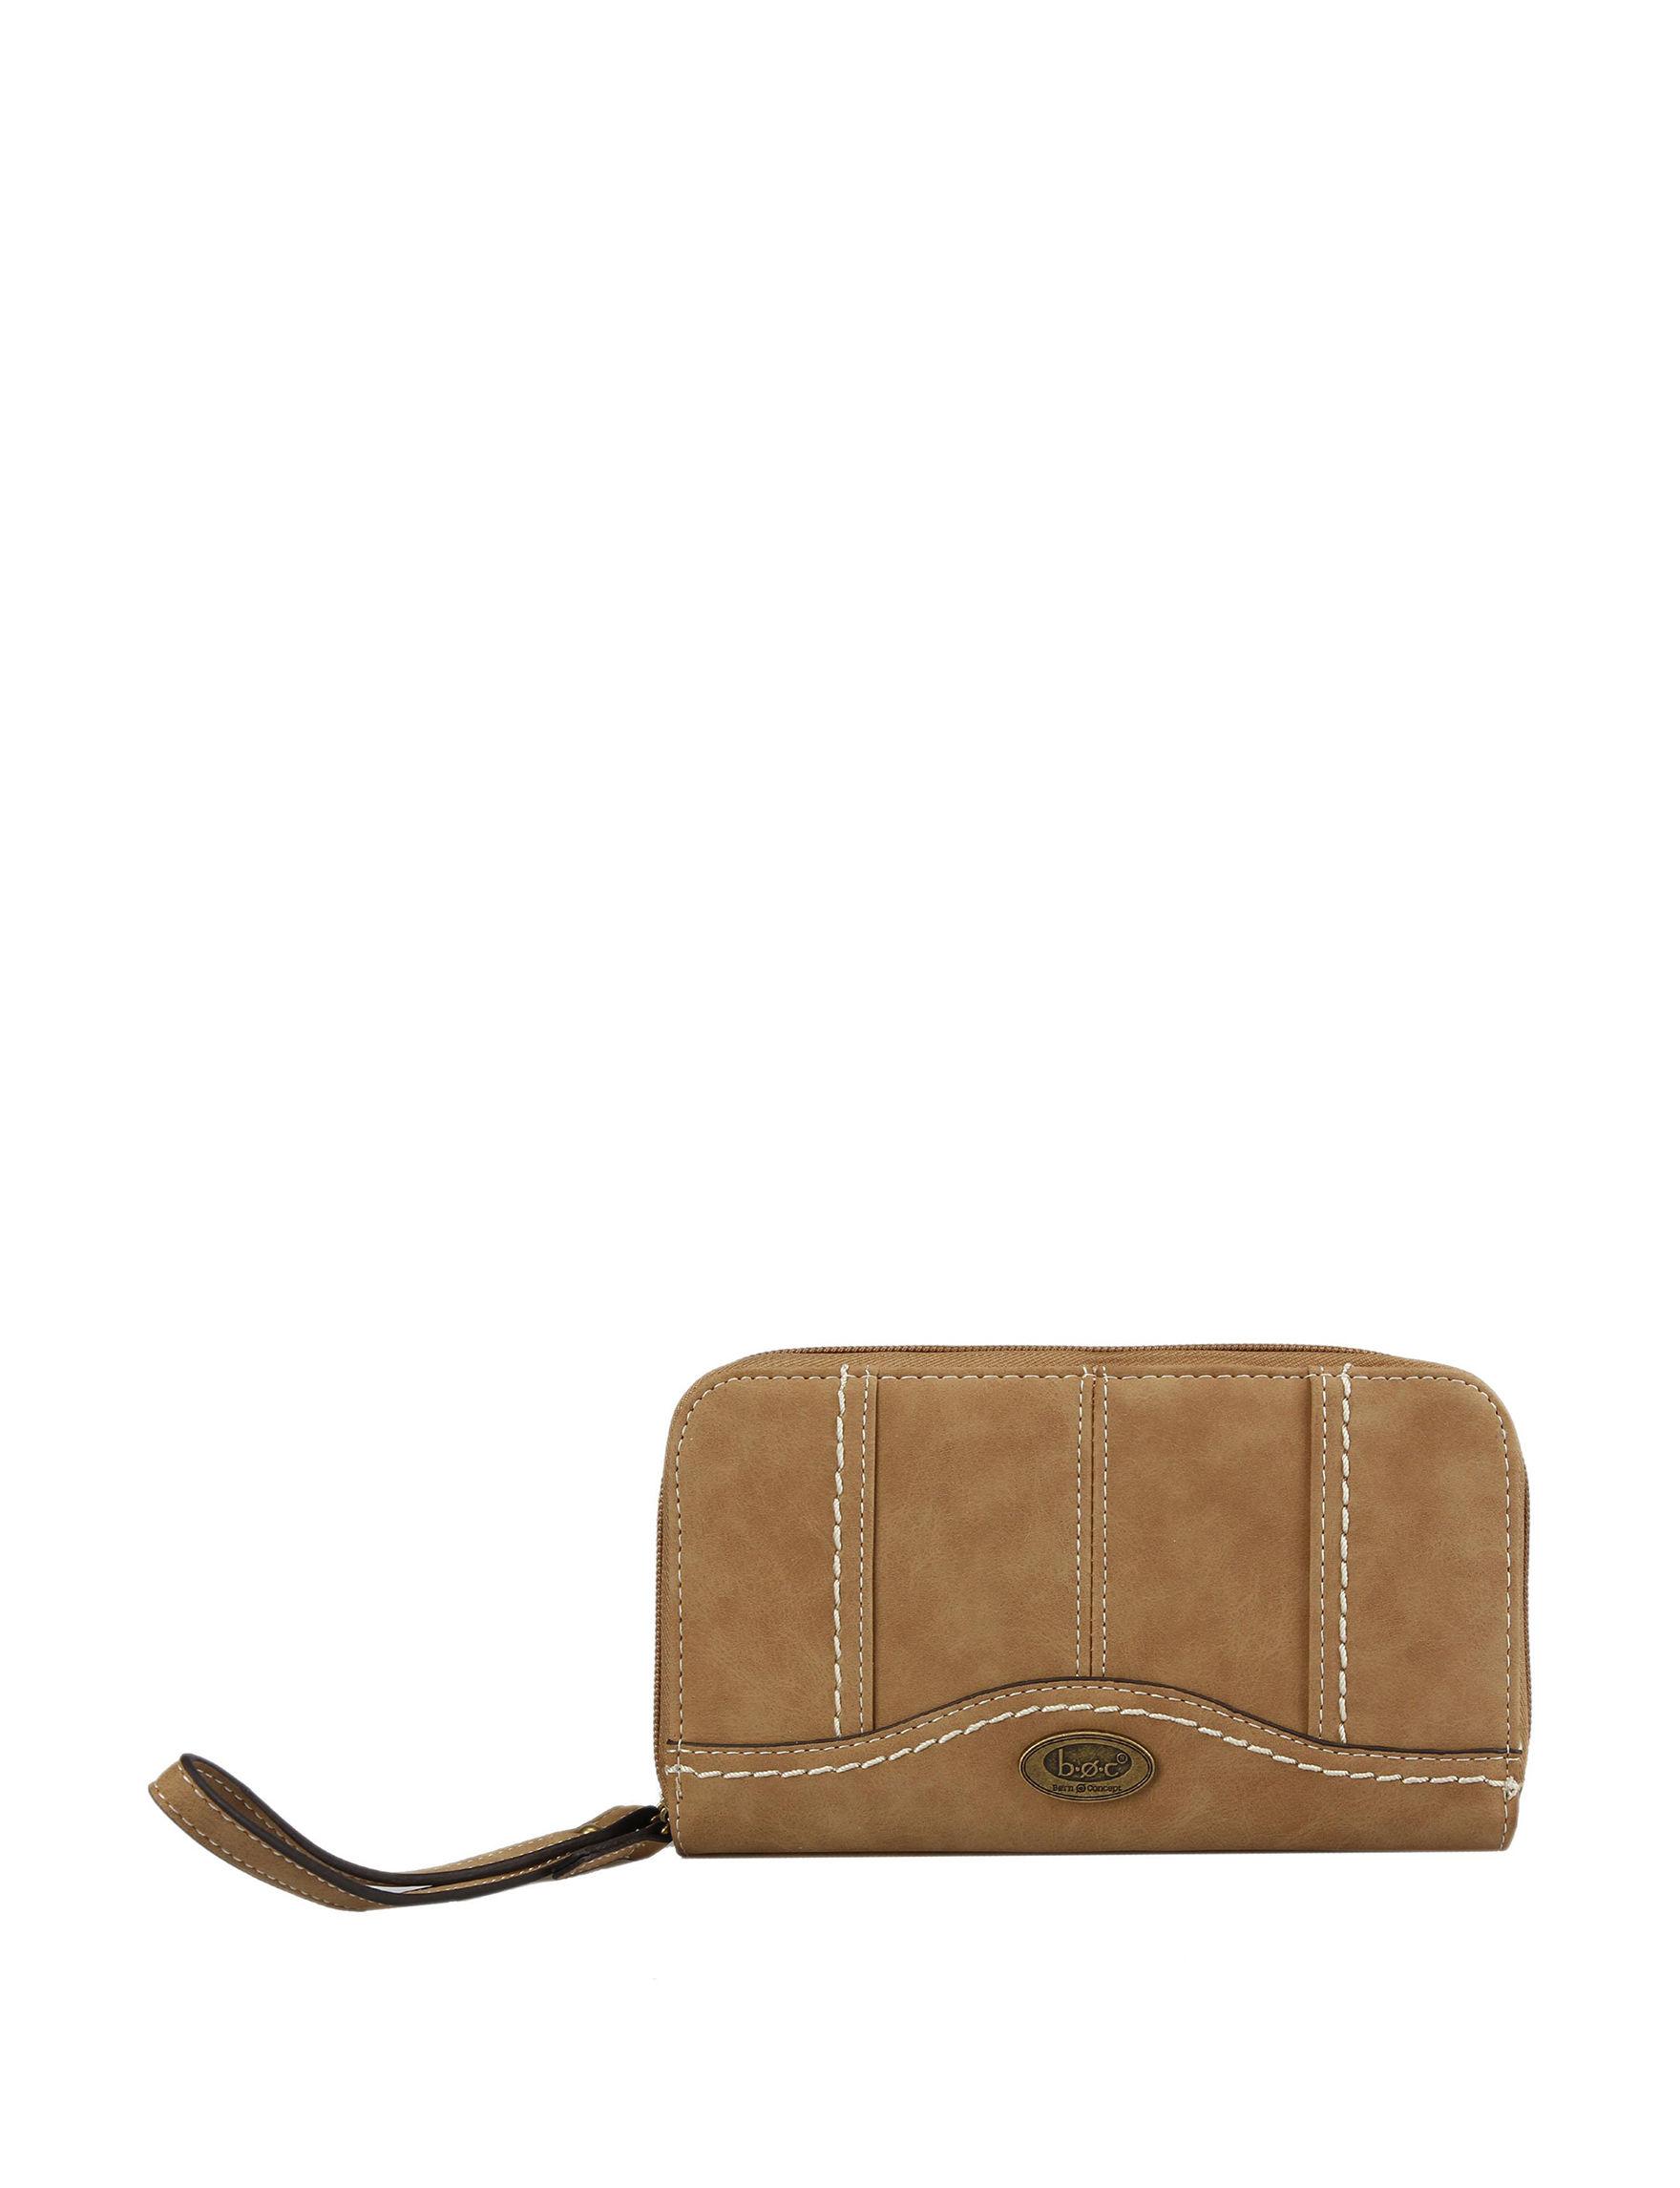 B.O.C. Brown Wallet